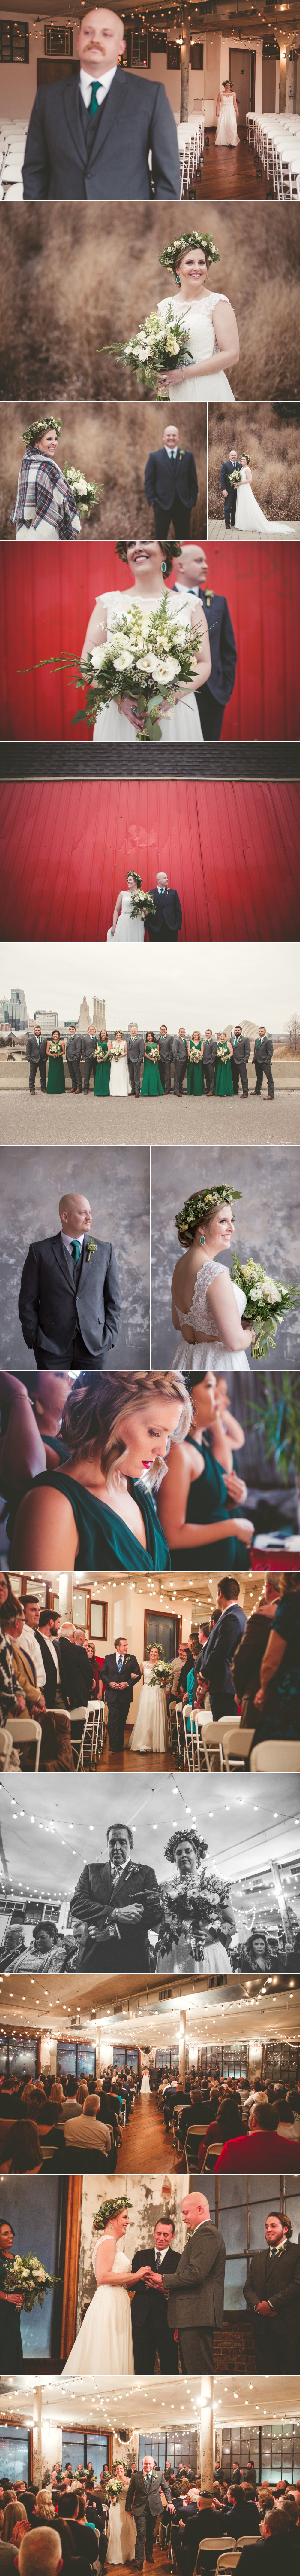 jason_domingues_photography_best_kansas_city_wedding_photographer_kc_weddings_the_bauer0002.jpg